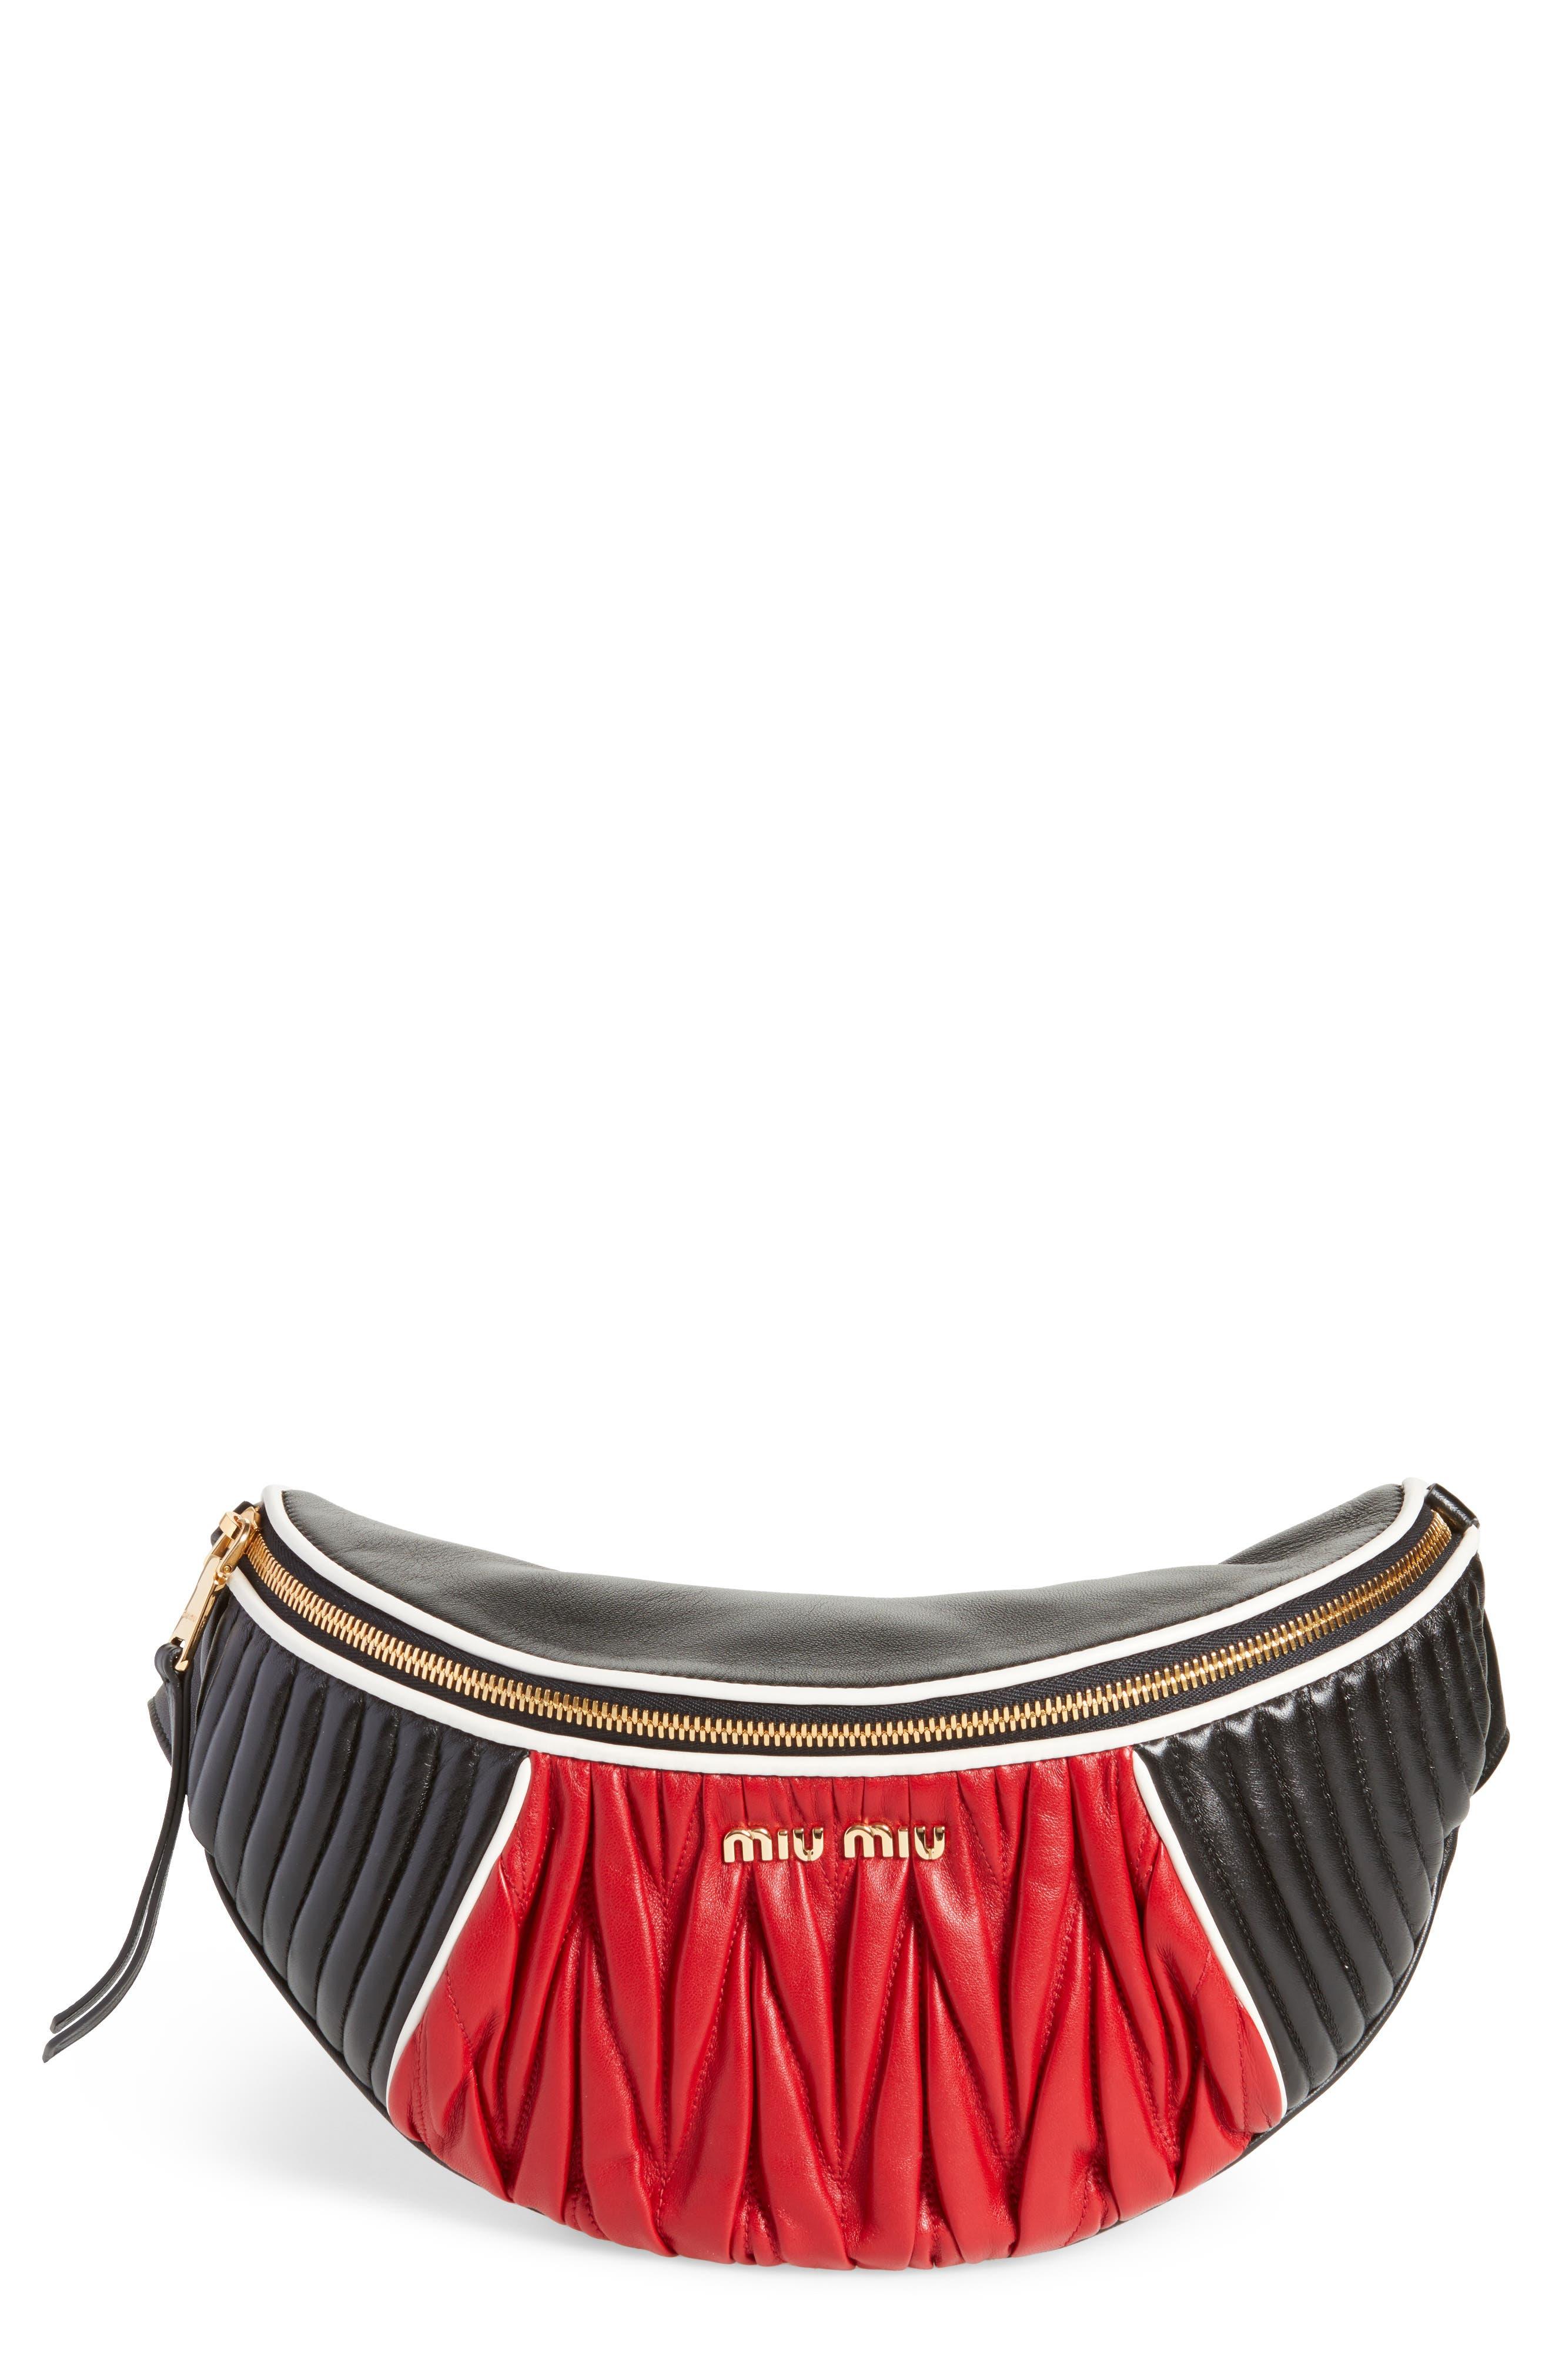 Alternate Image 1 Selected - Miu Miu Rider Matelassé Leather Belt Bag